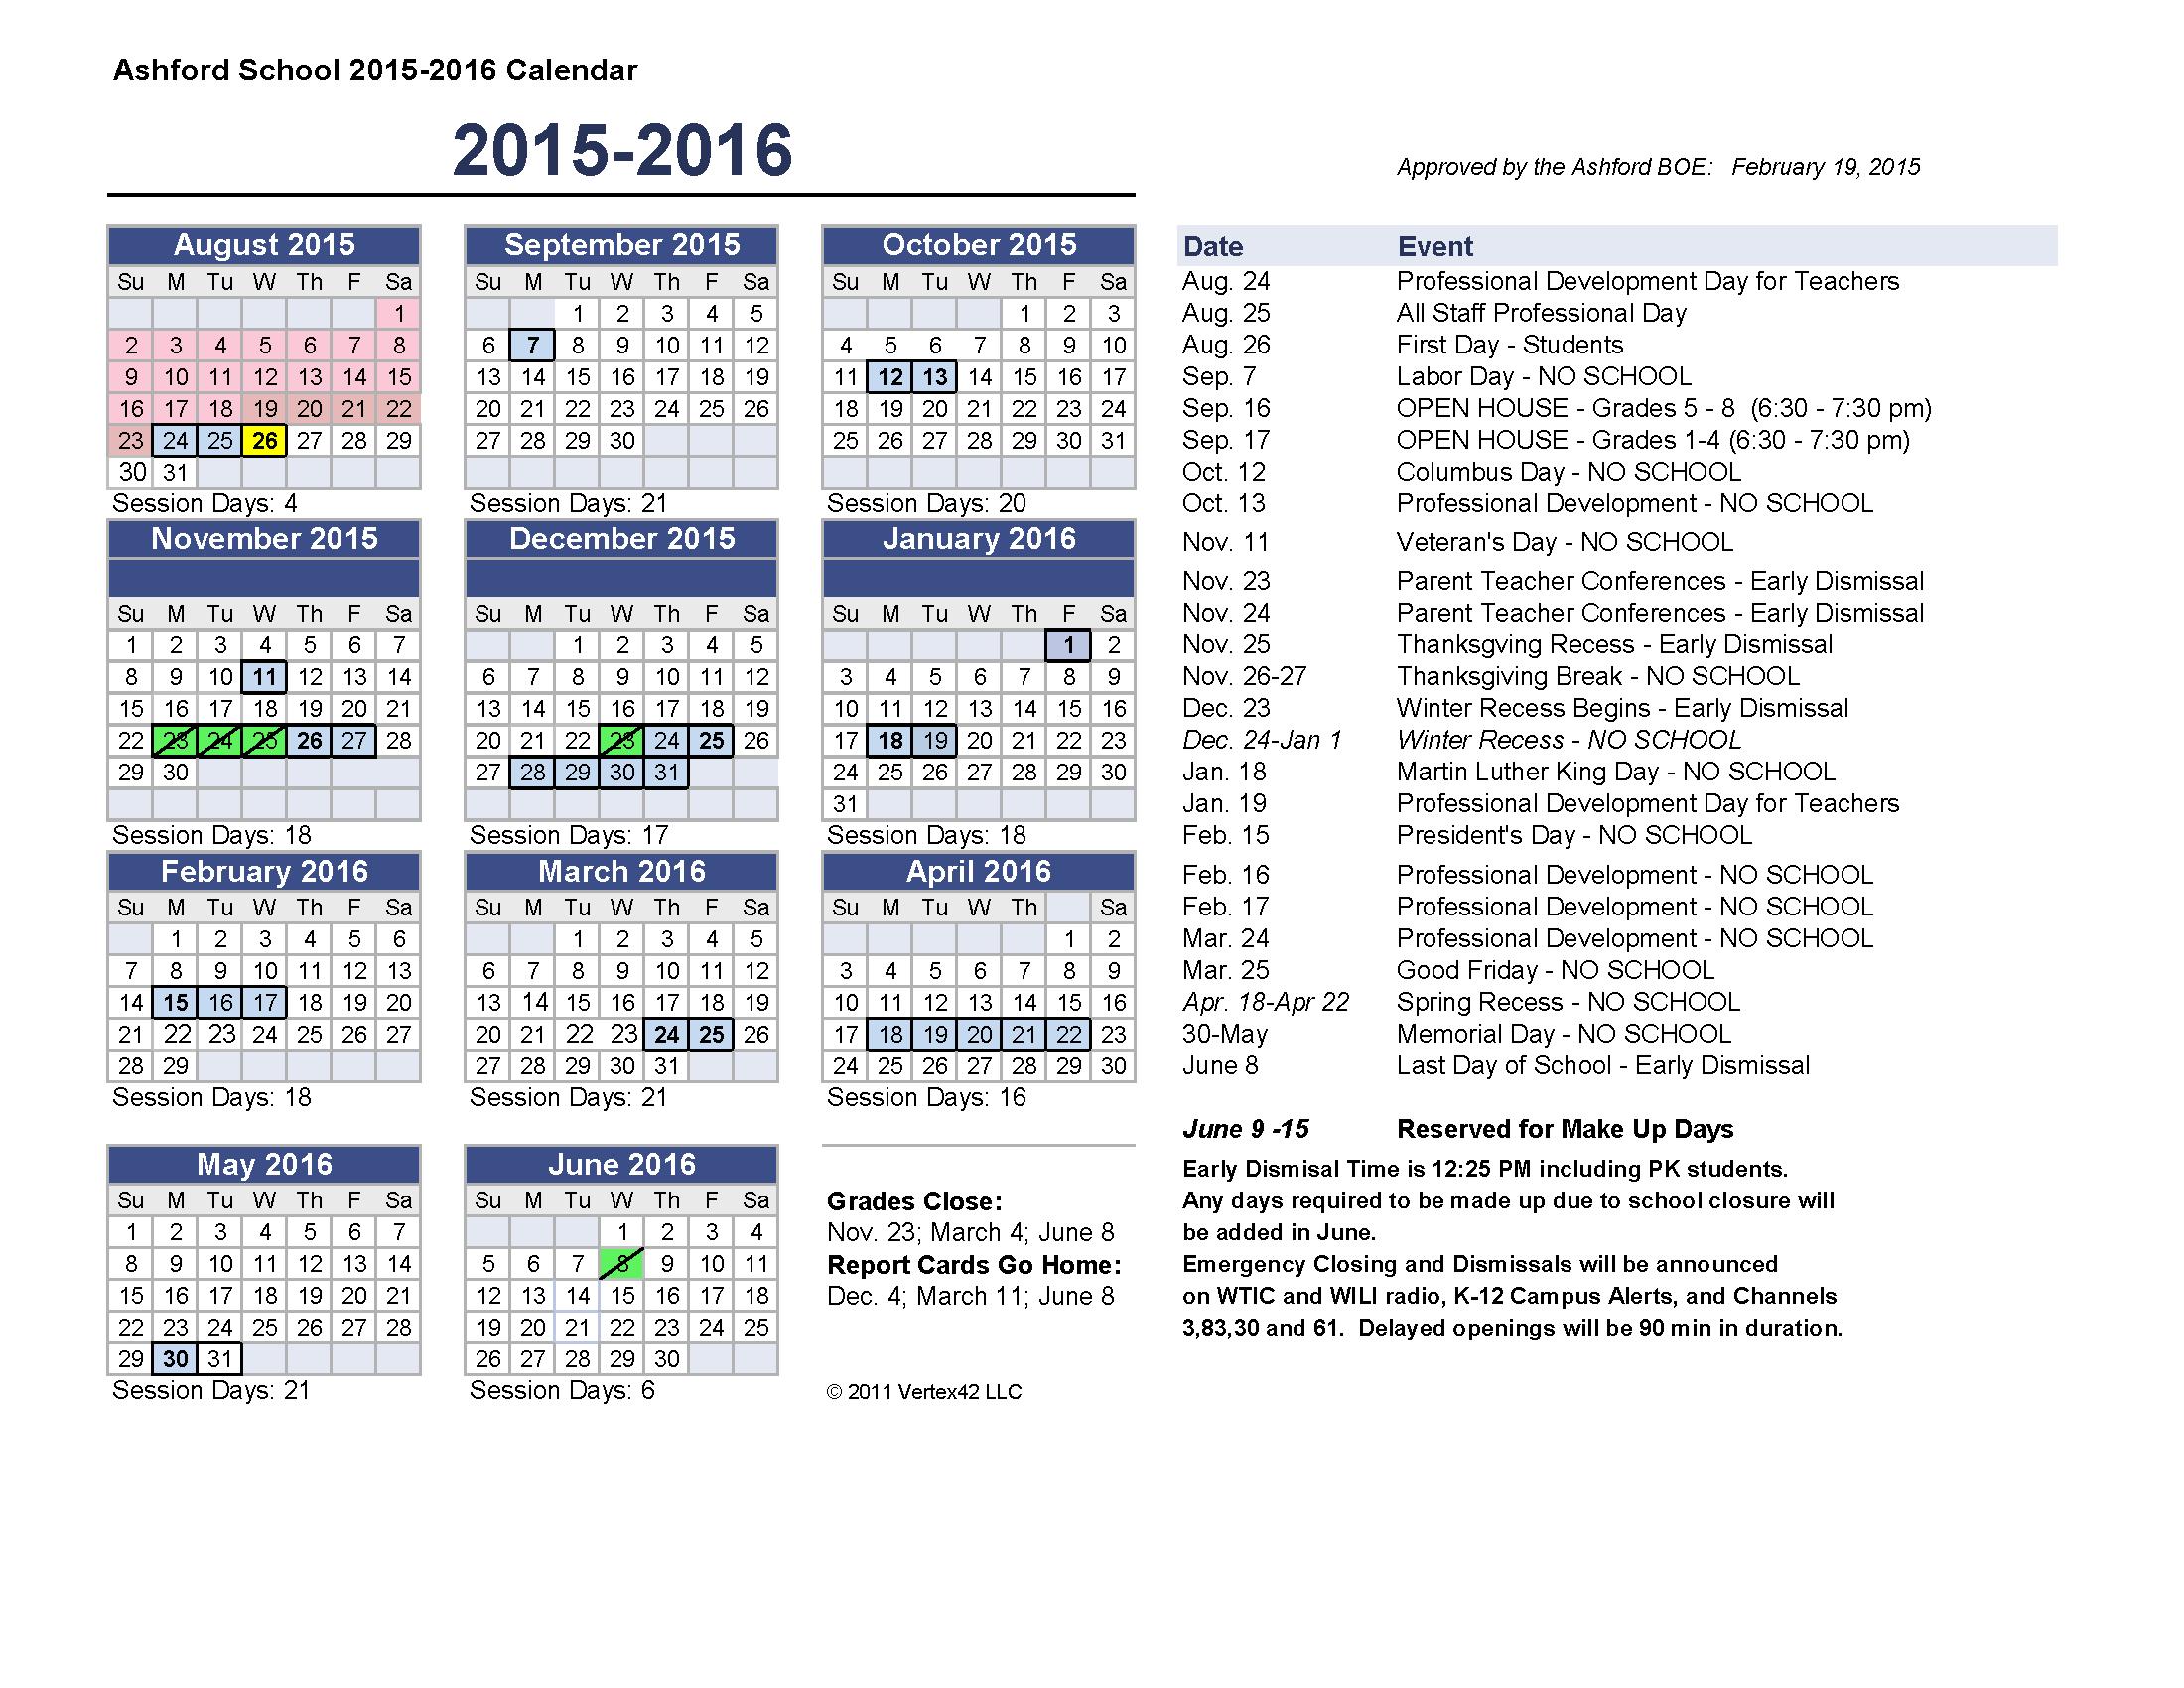 Jmu 2016 More information tagbook